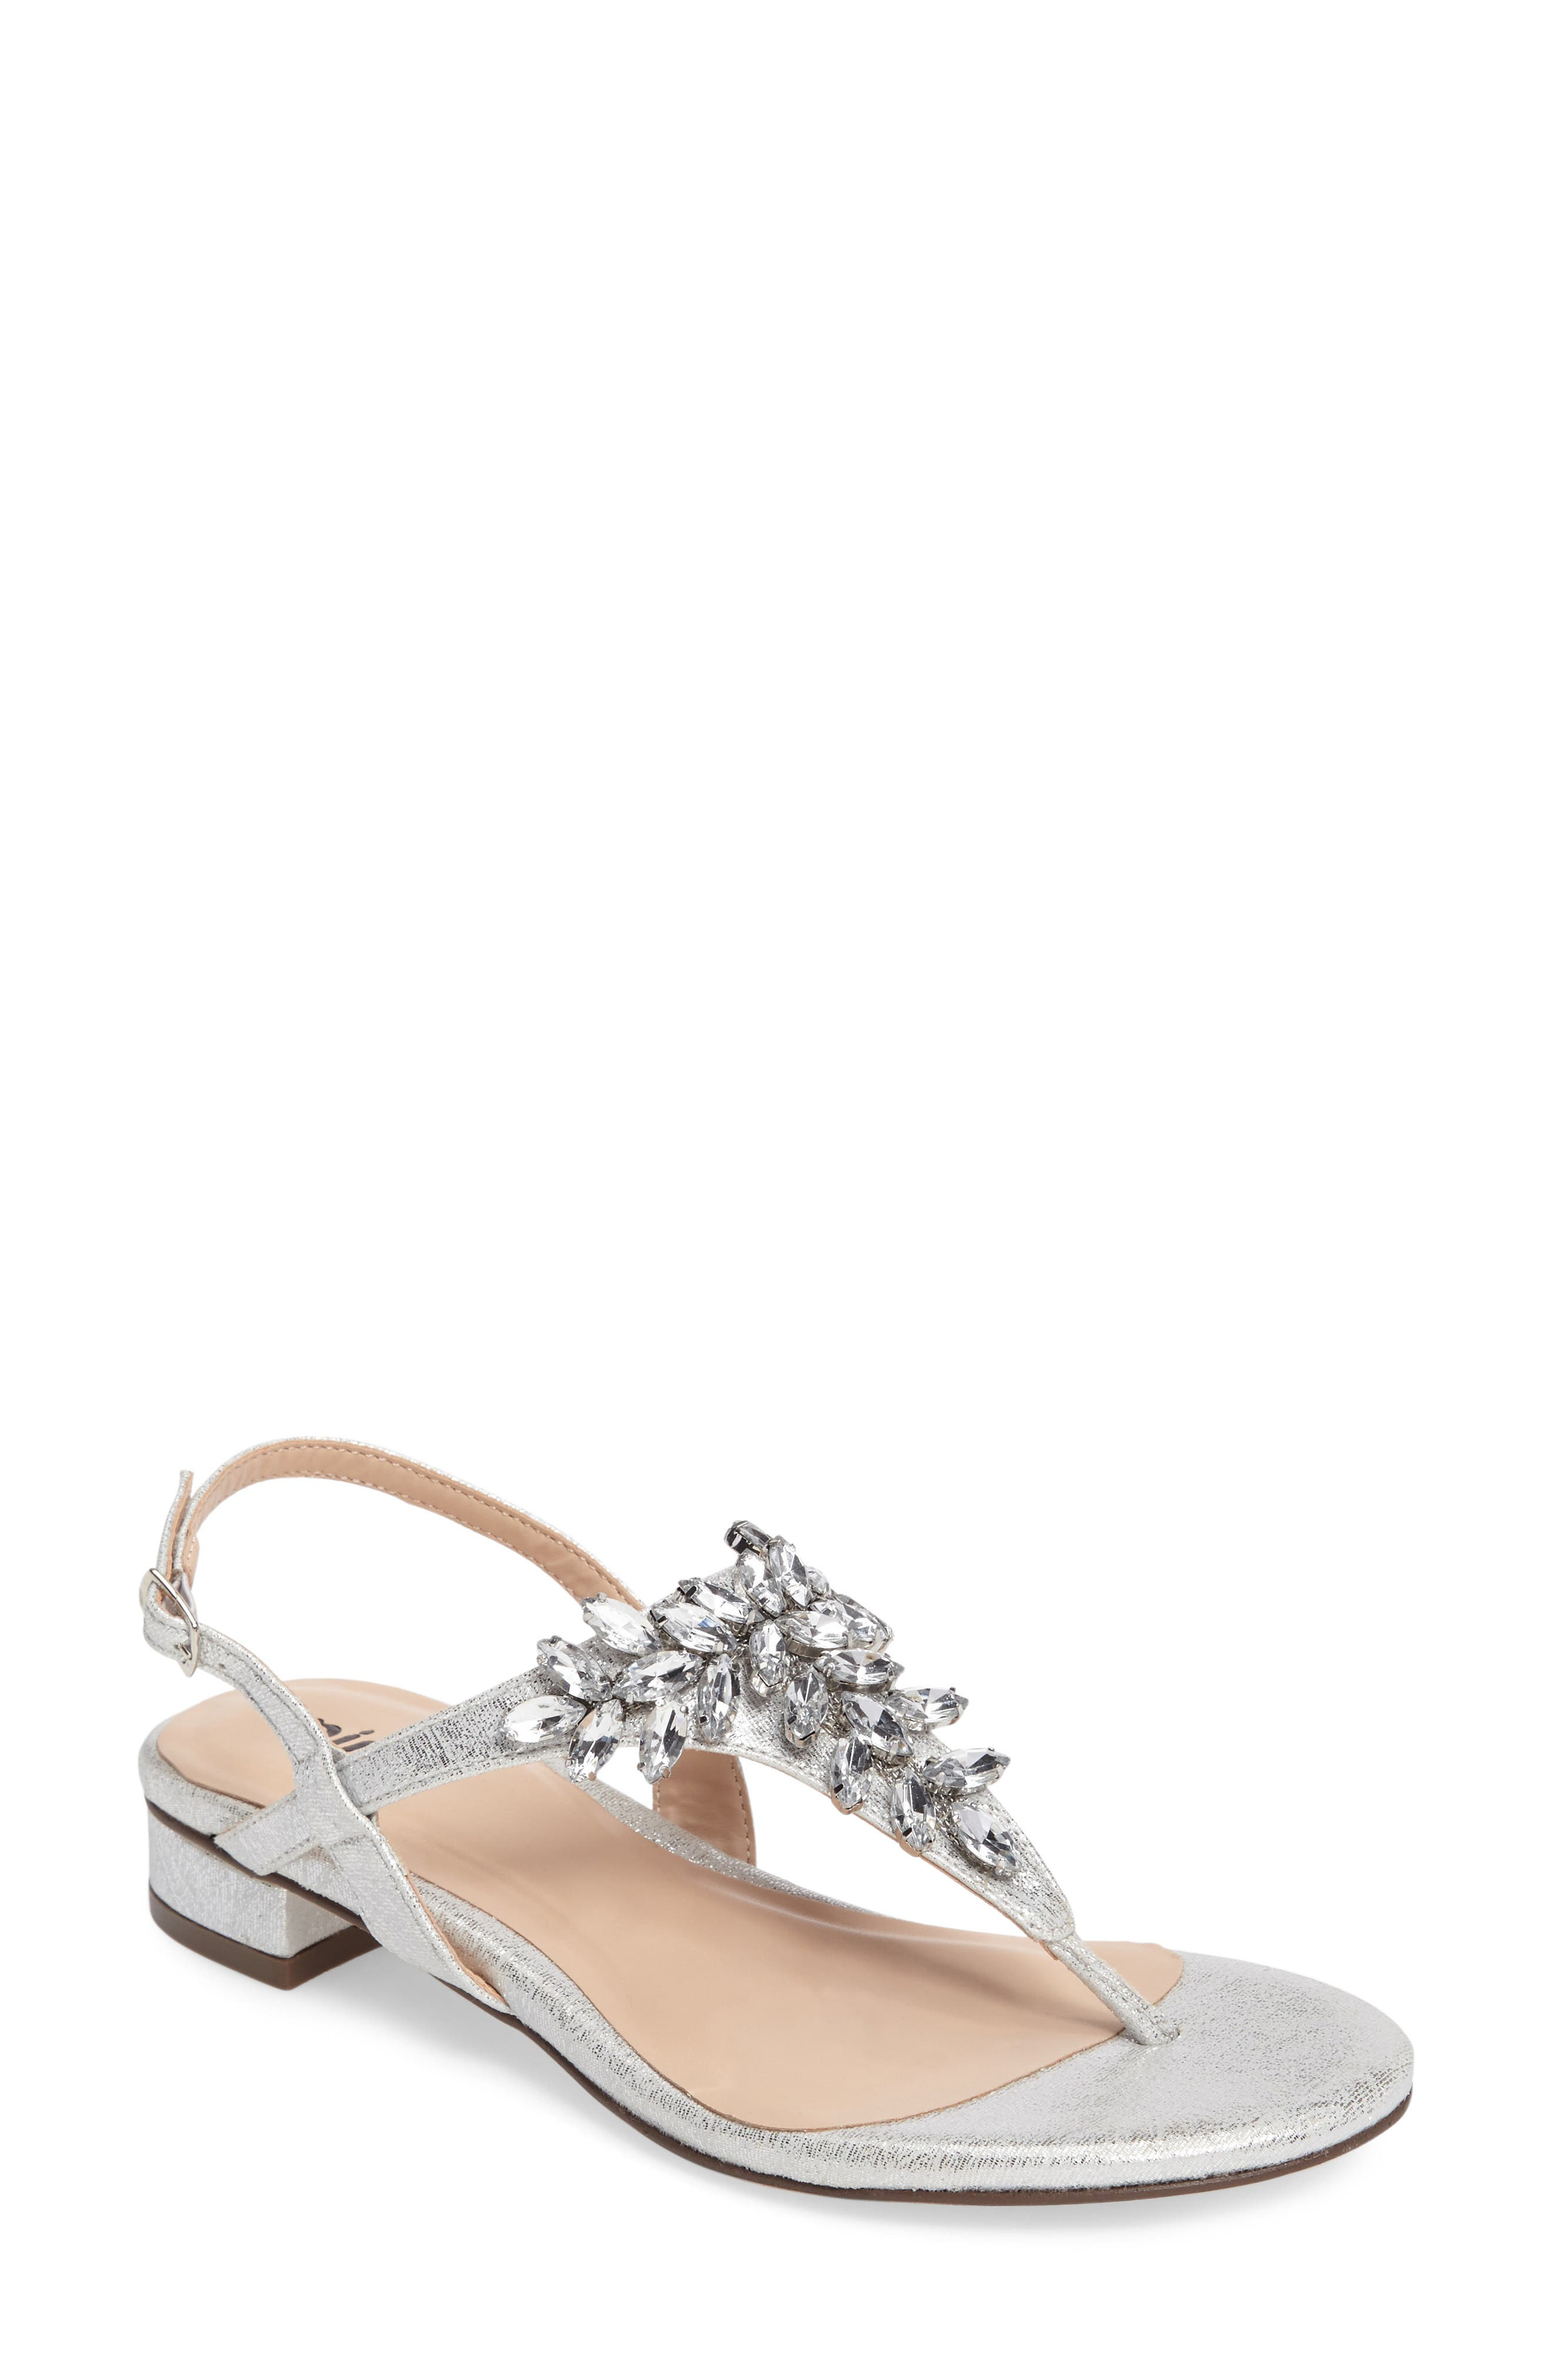 Flame Crystal Embellished Sandal,                             Main thumbnail 1, color,                             Silver